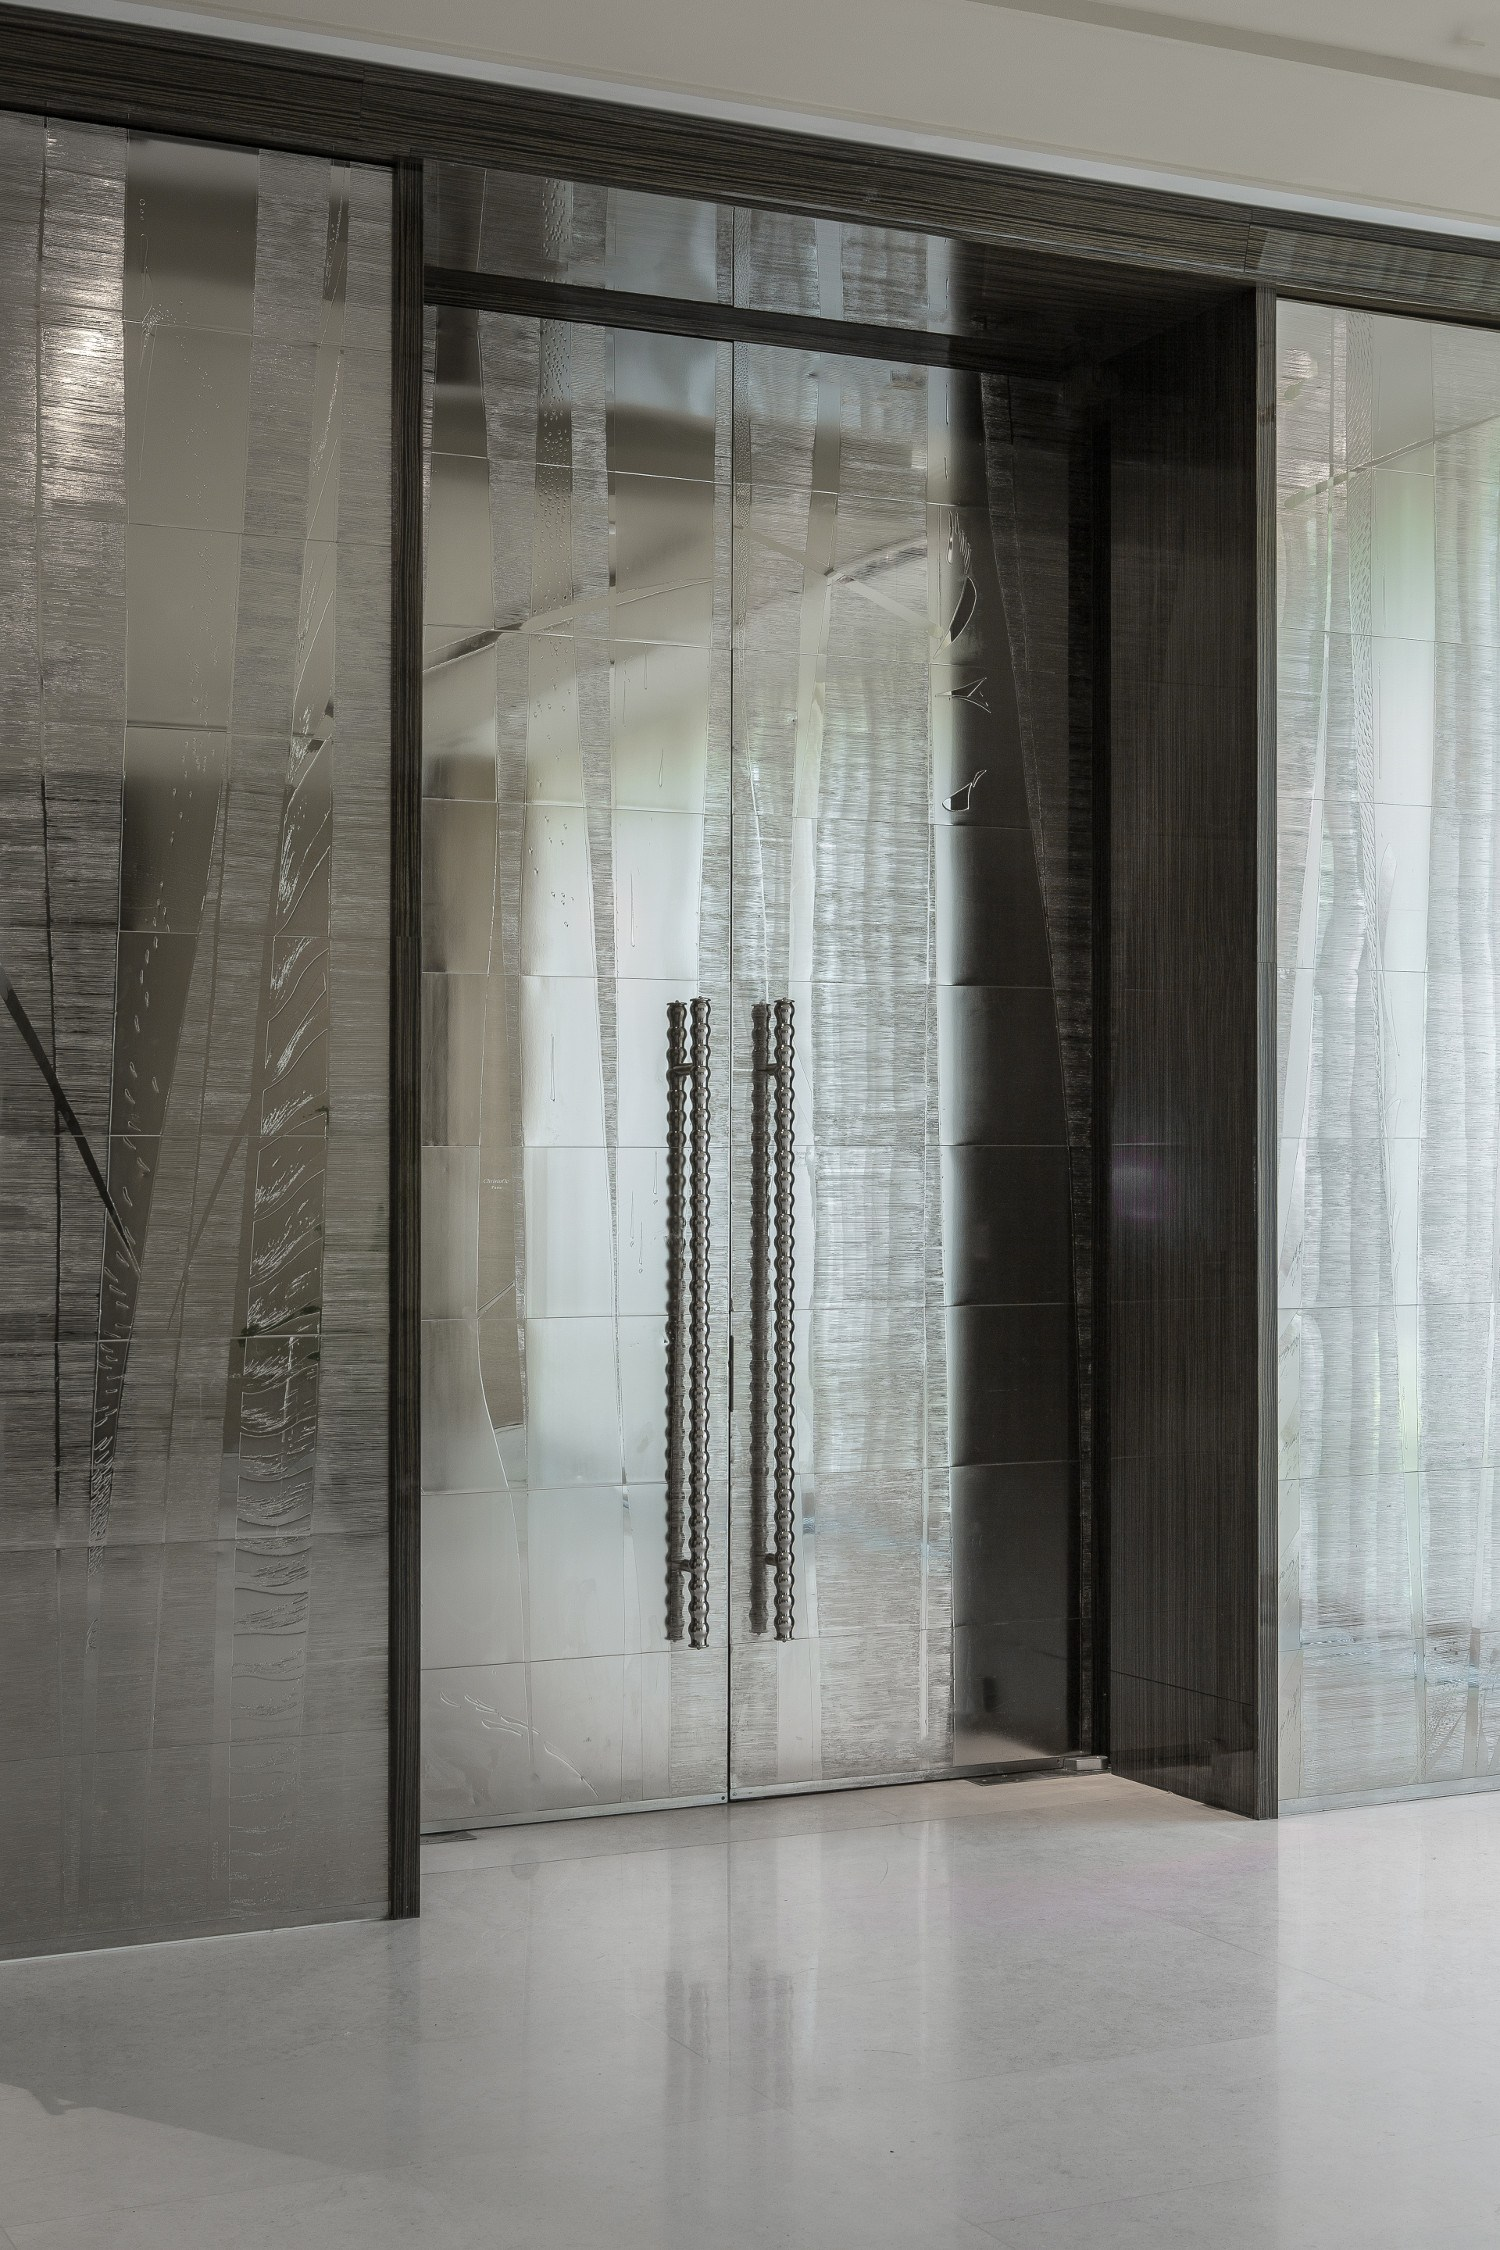 InterContinental-Geneva-Hotel-Art-Exhibitions-Christian-Heckscher-for-Christofle